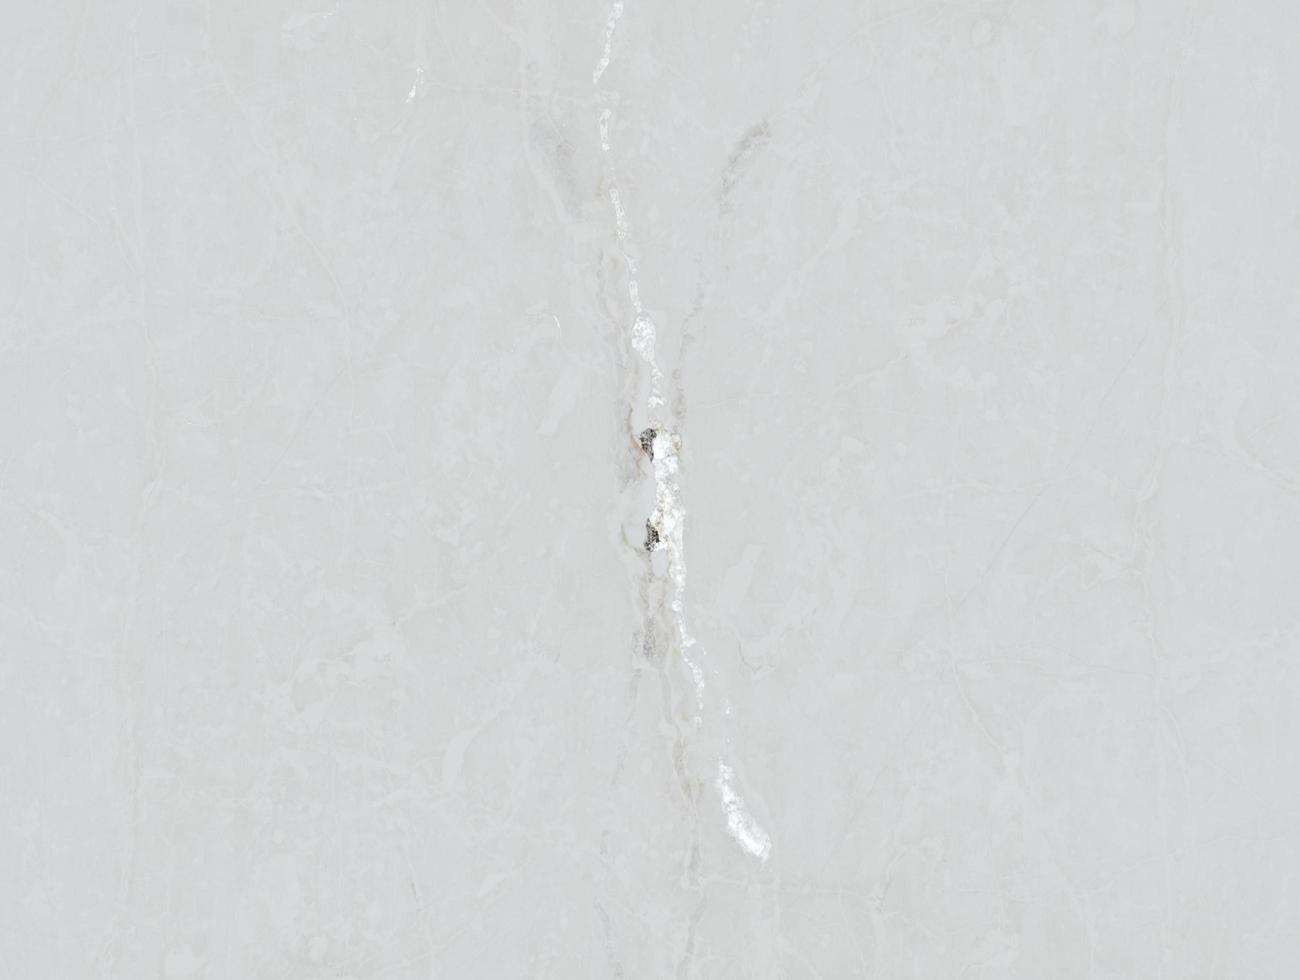 fond de texture de pierre minimaliste photo